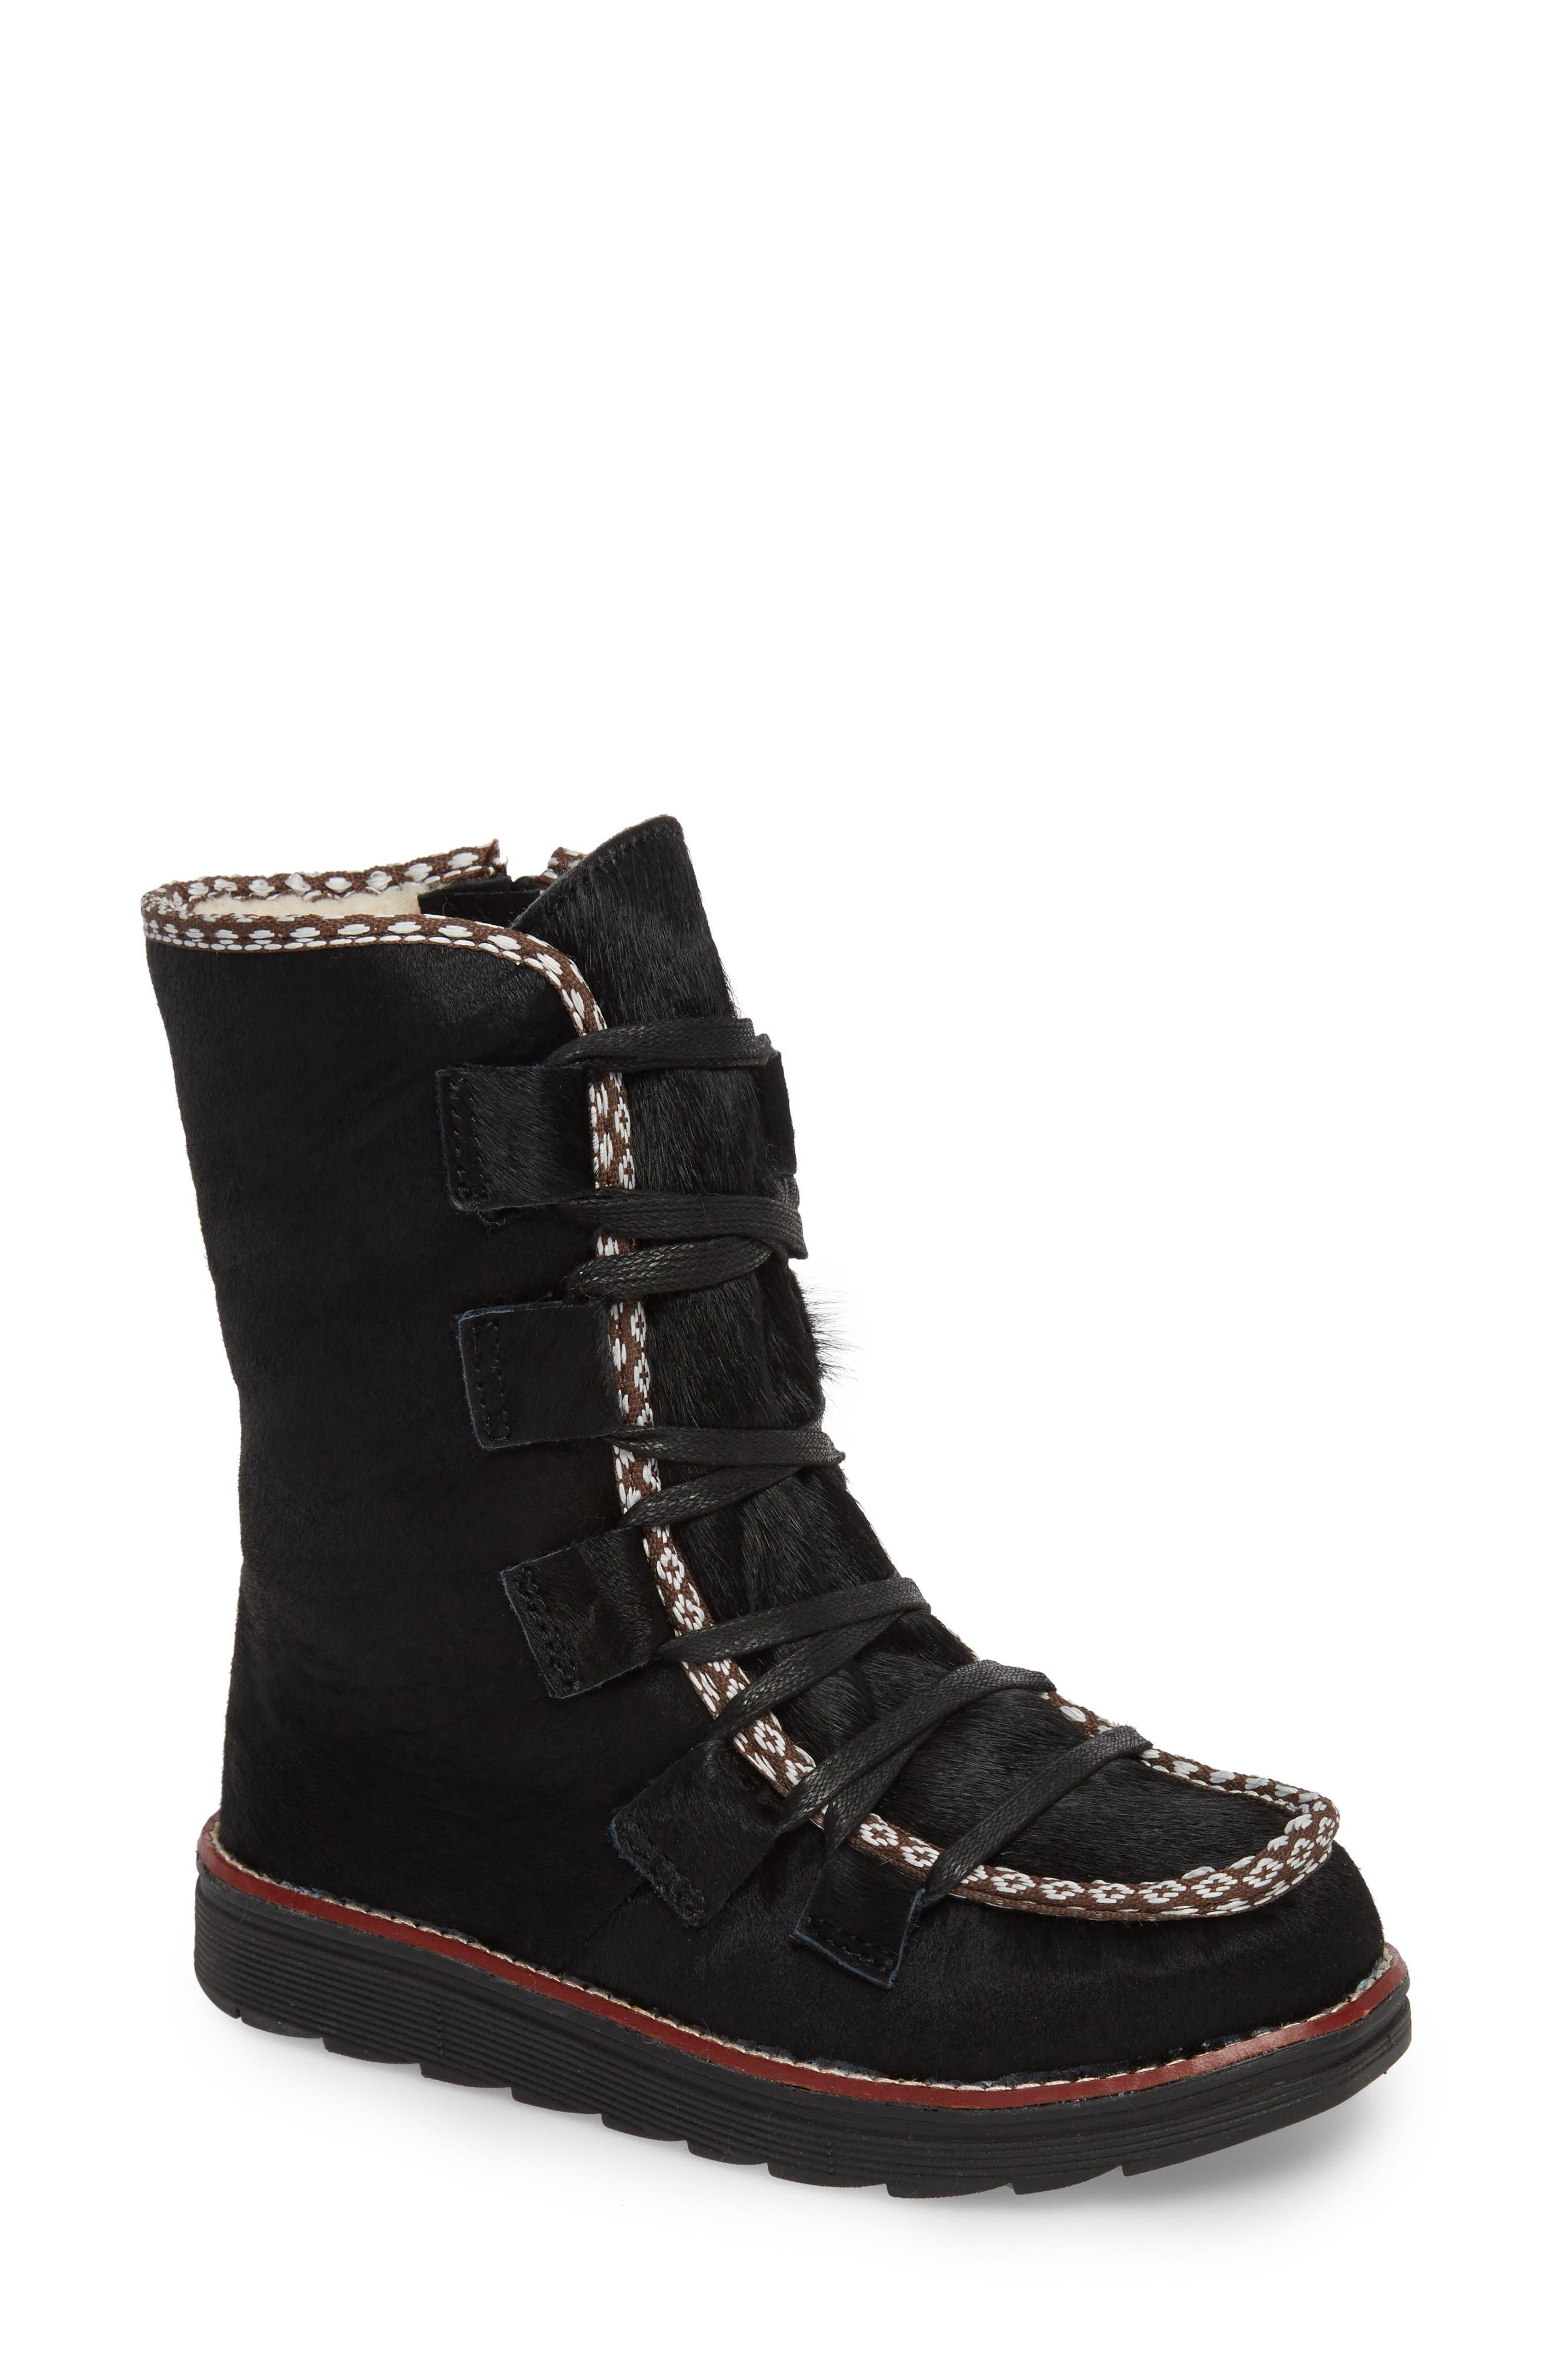 Kitchener Waterproof Genuine Calf Hair Snow Boot,                         Main,                         color, Black